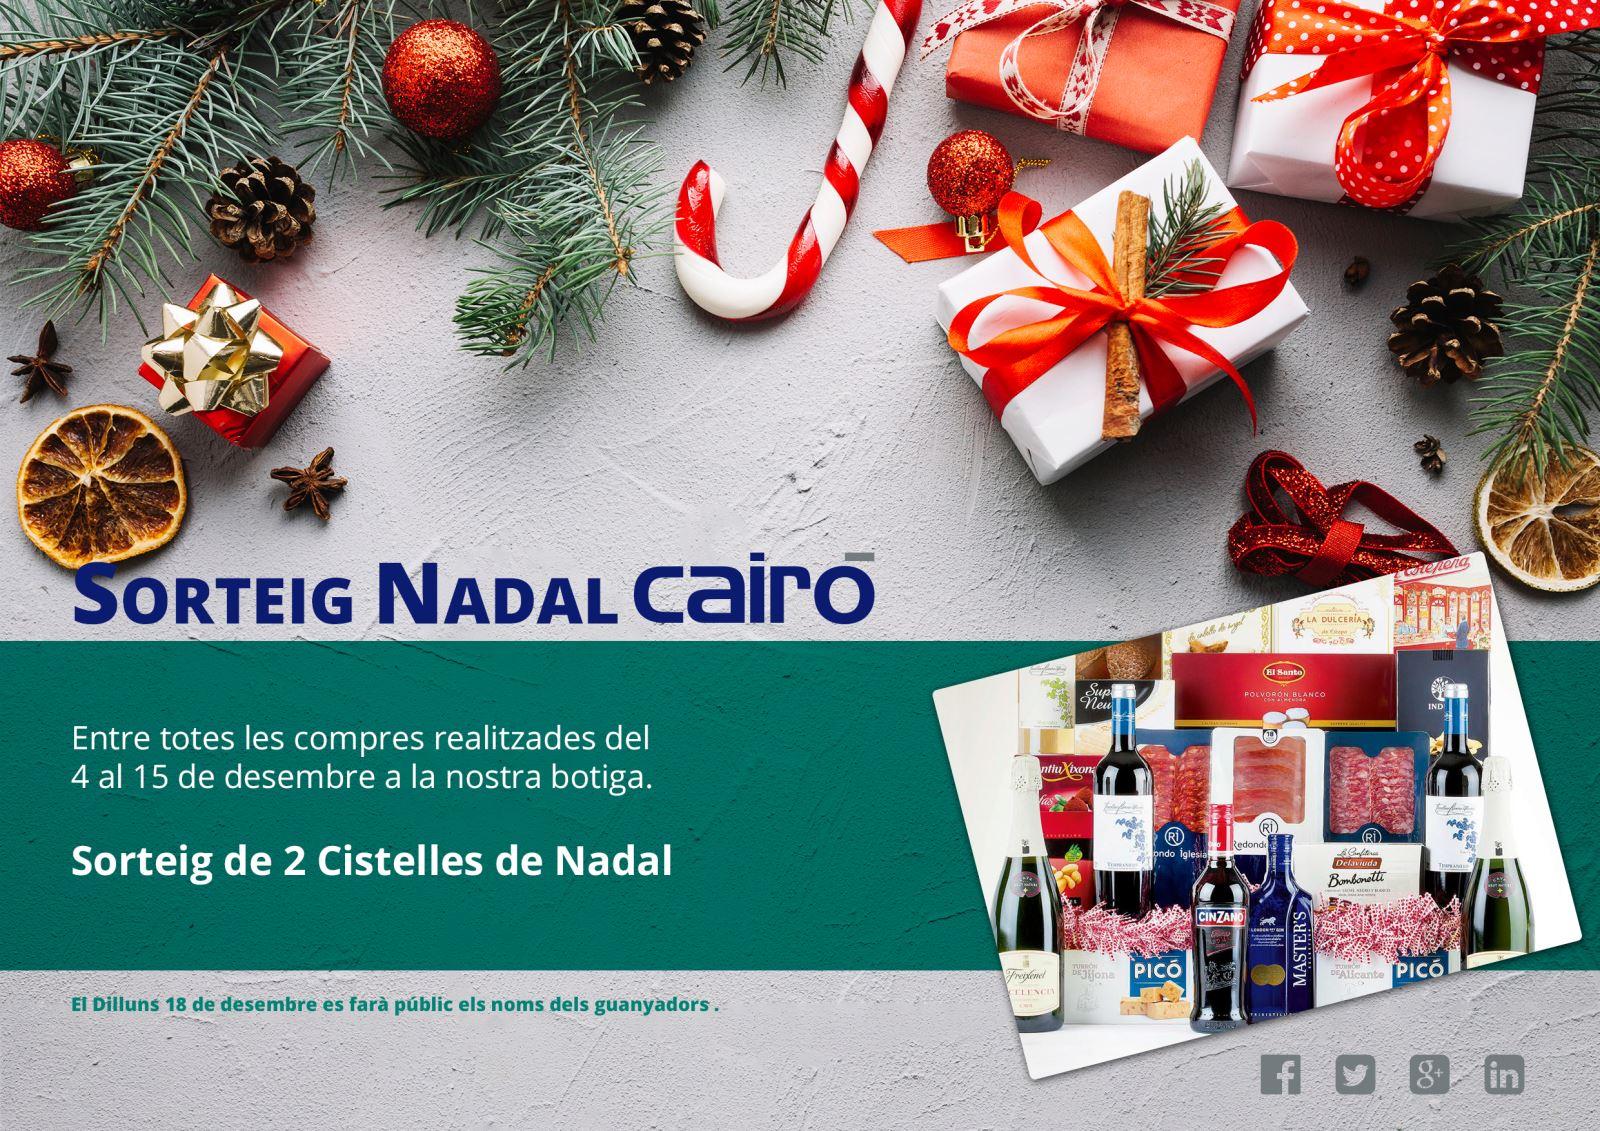 Sorteig cistelles Nadal Cairó